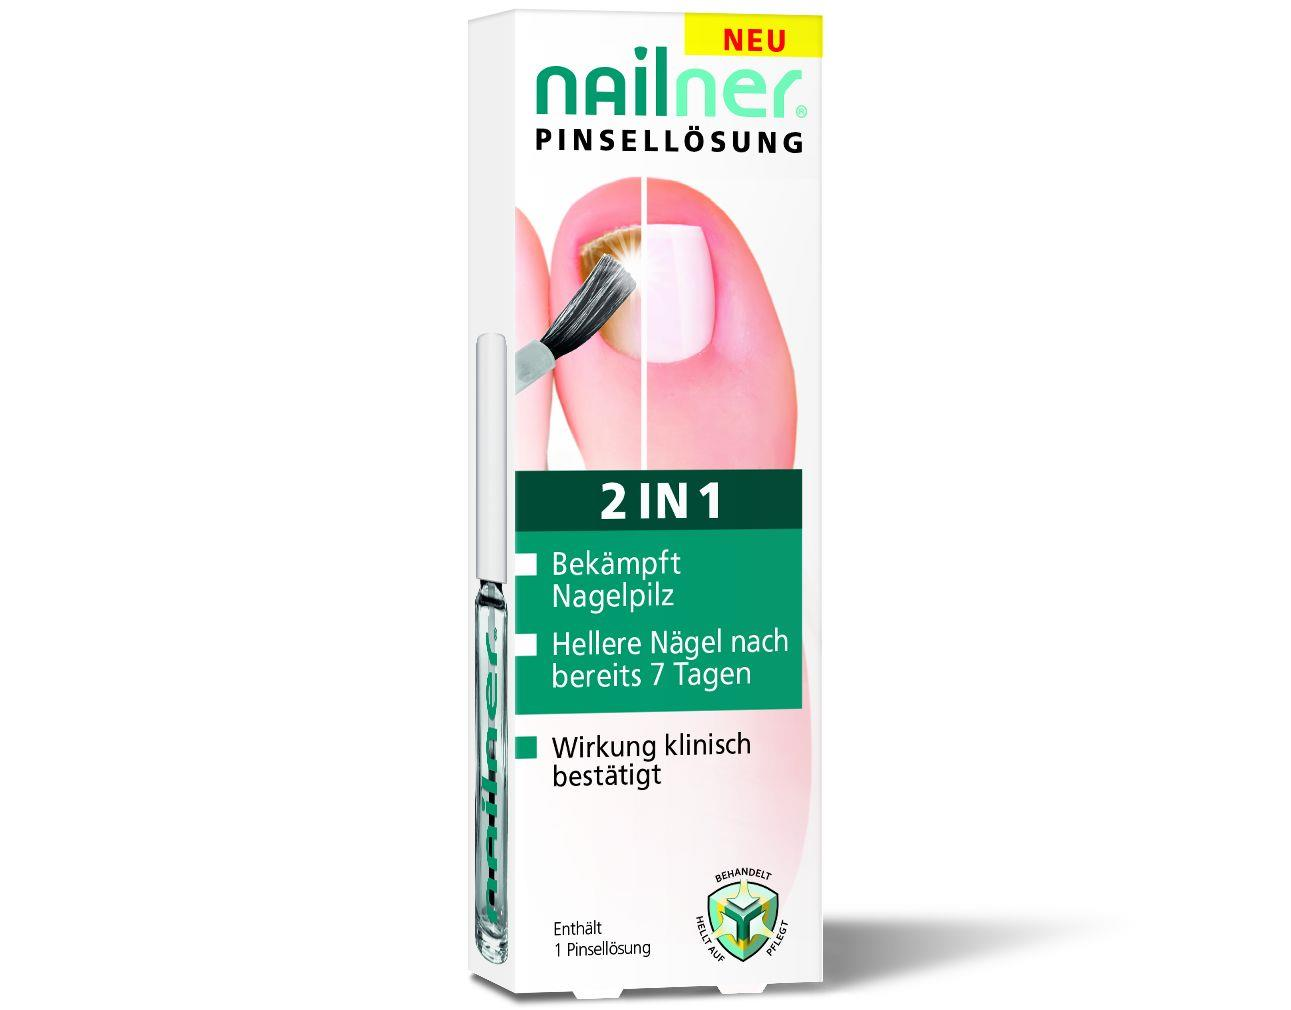 Nailner Nagelpilz 2in1 Pinsellösung